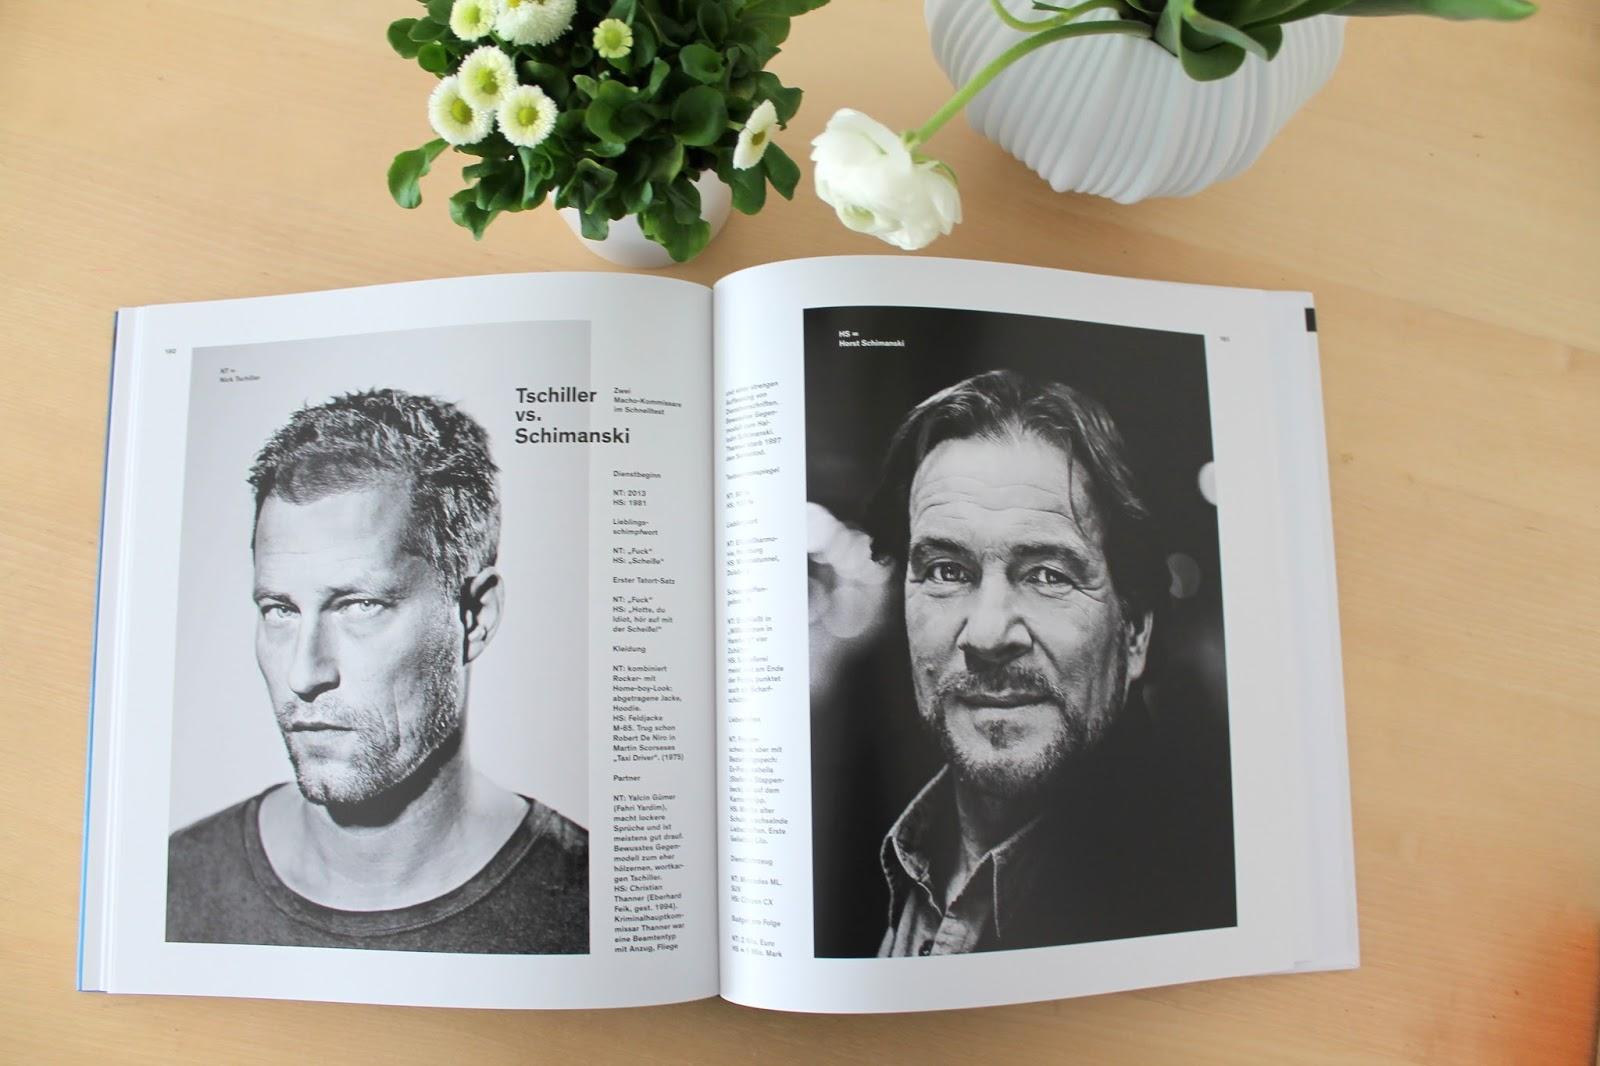 Innenseiten Hamburger Tatort Nik Tschiller vs Schimanski